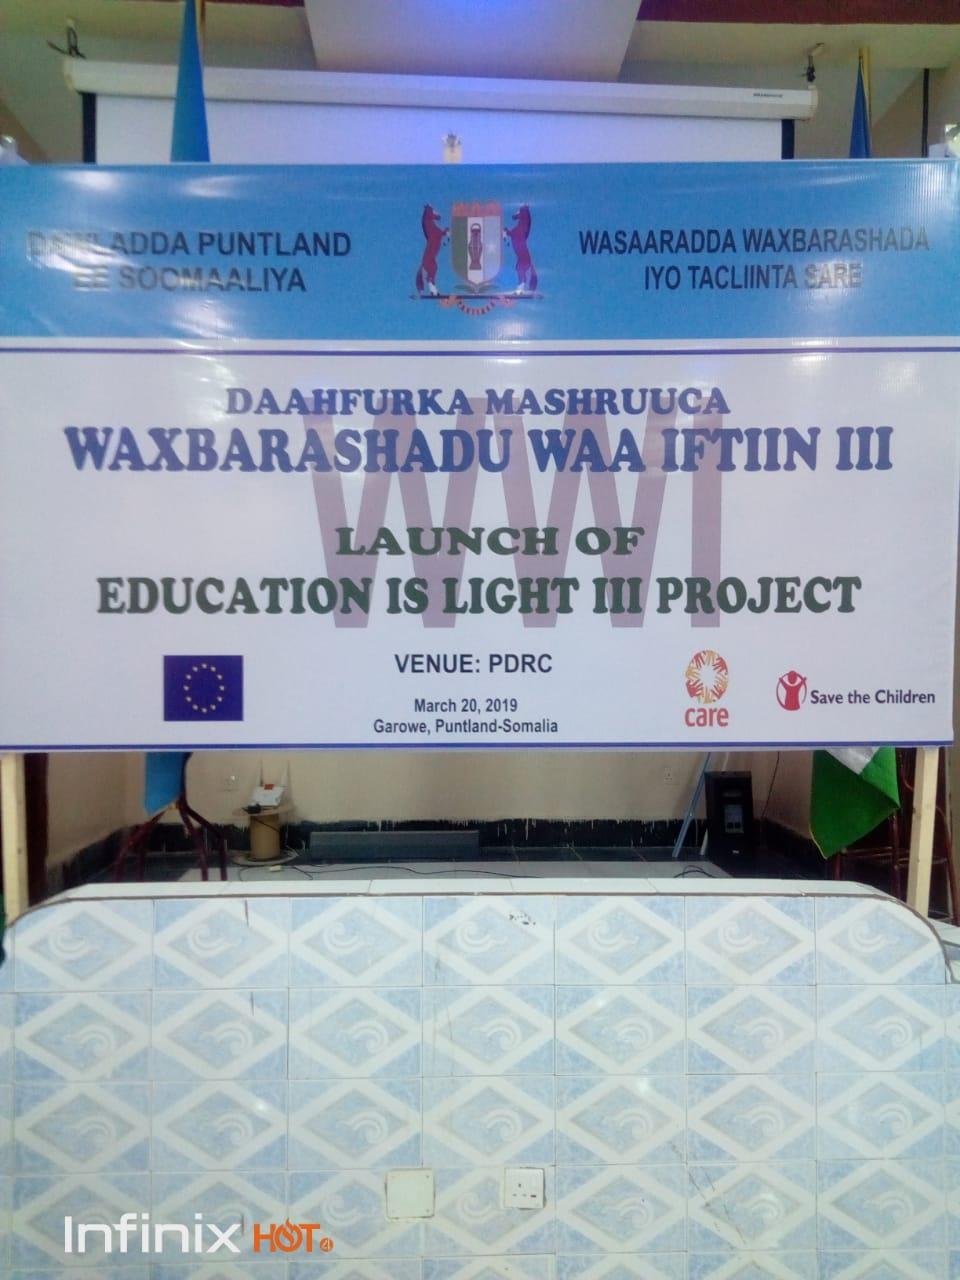 Launch of Education for Light III Project PUNTLAND SOMALIA Puntland 2